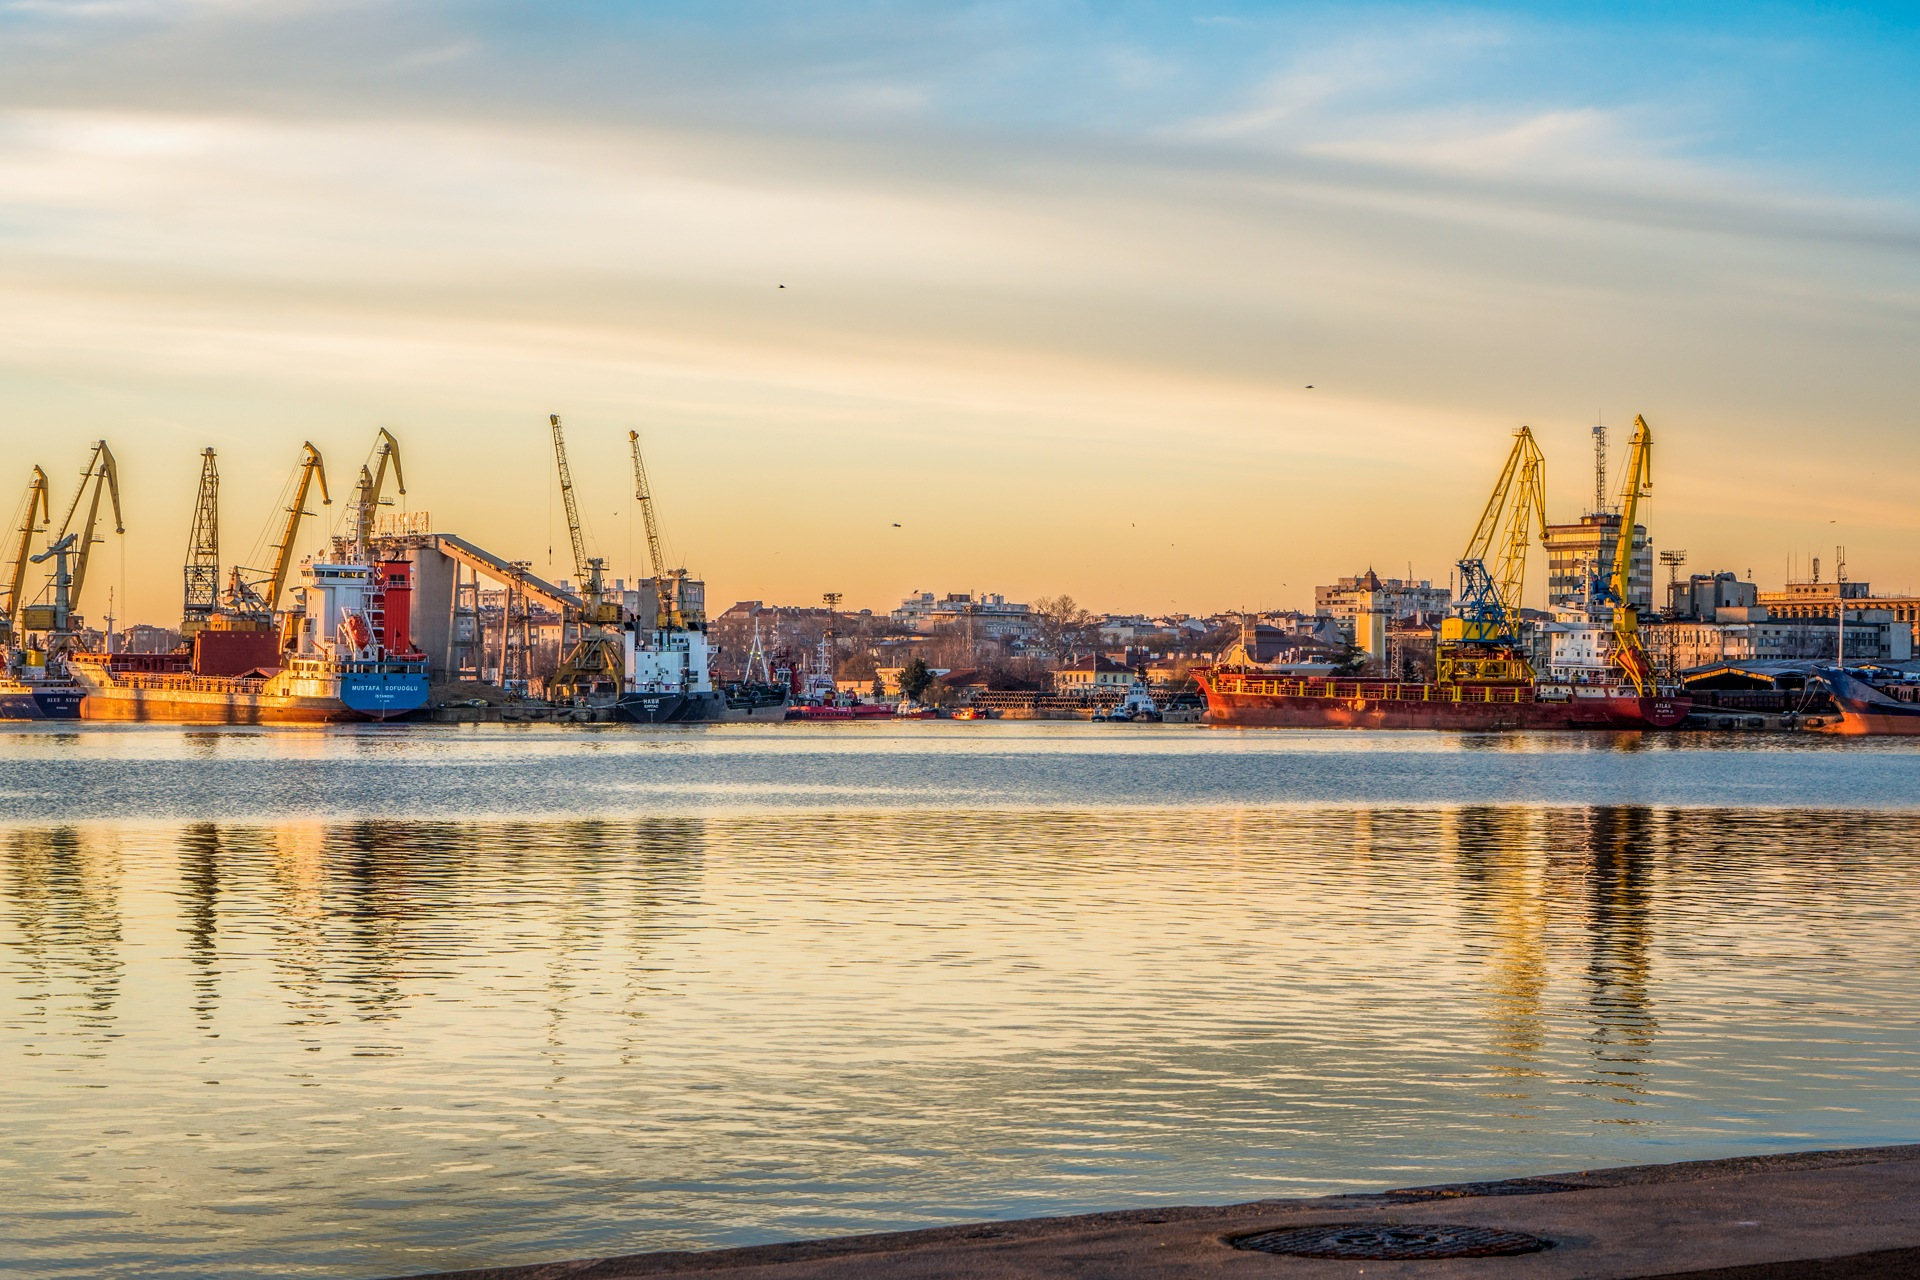 Port - late evening by Venelin Todorov